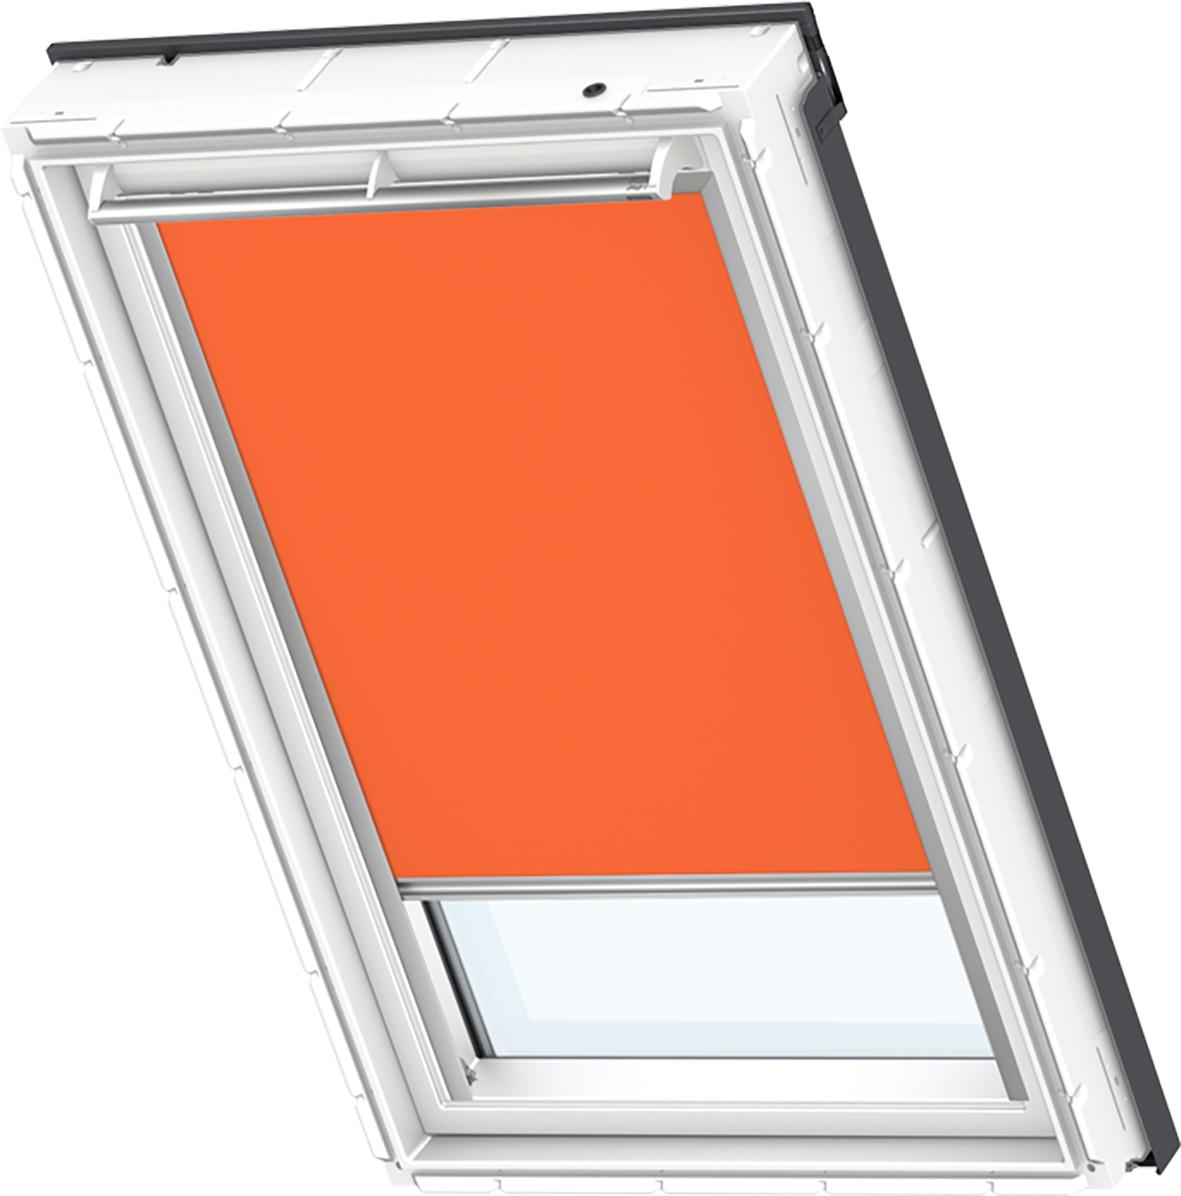 orig velux verdunklungsrollo thermorollo gelb orange ggl. Black Bedroom Furniture Sets. Home Design Ideas